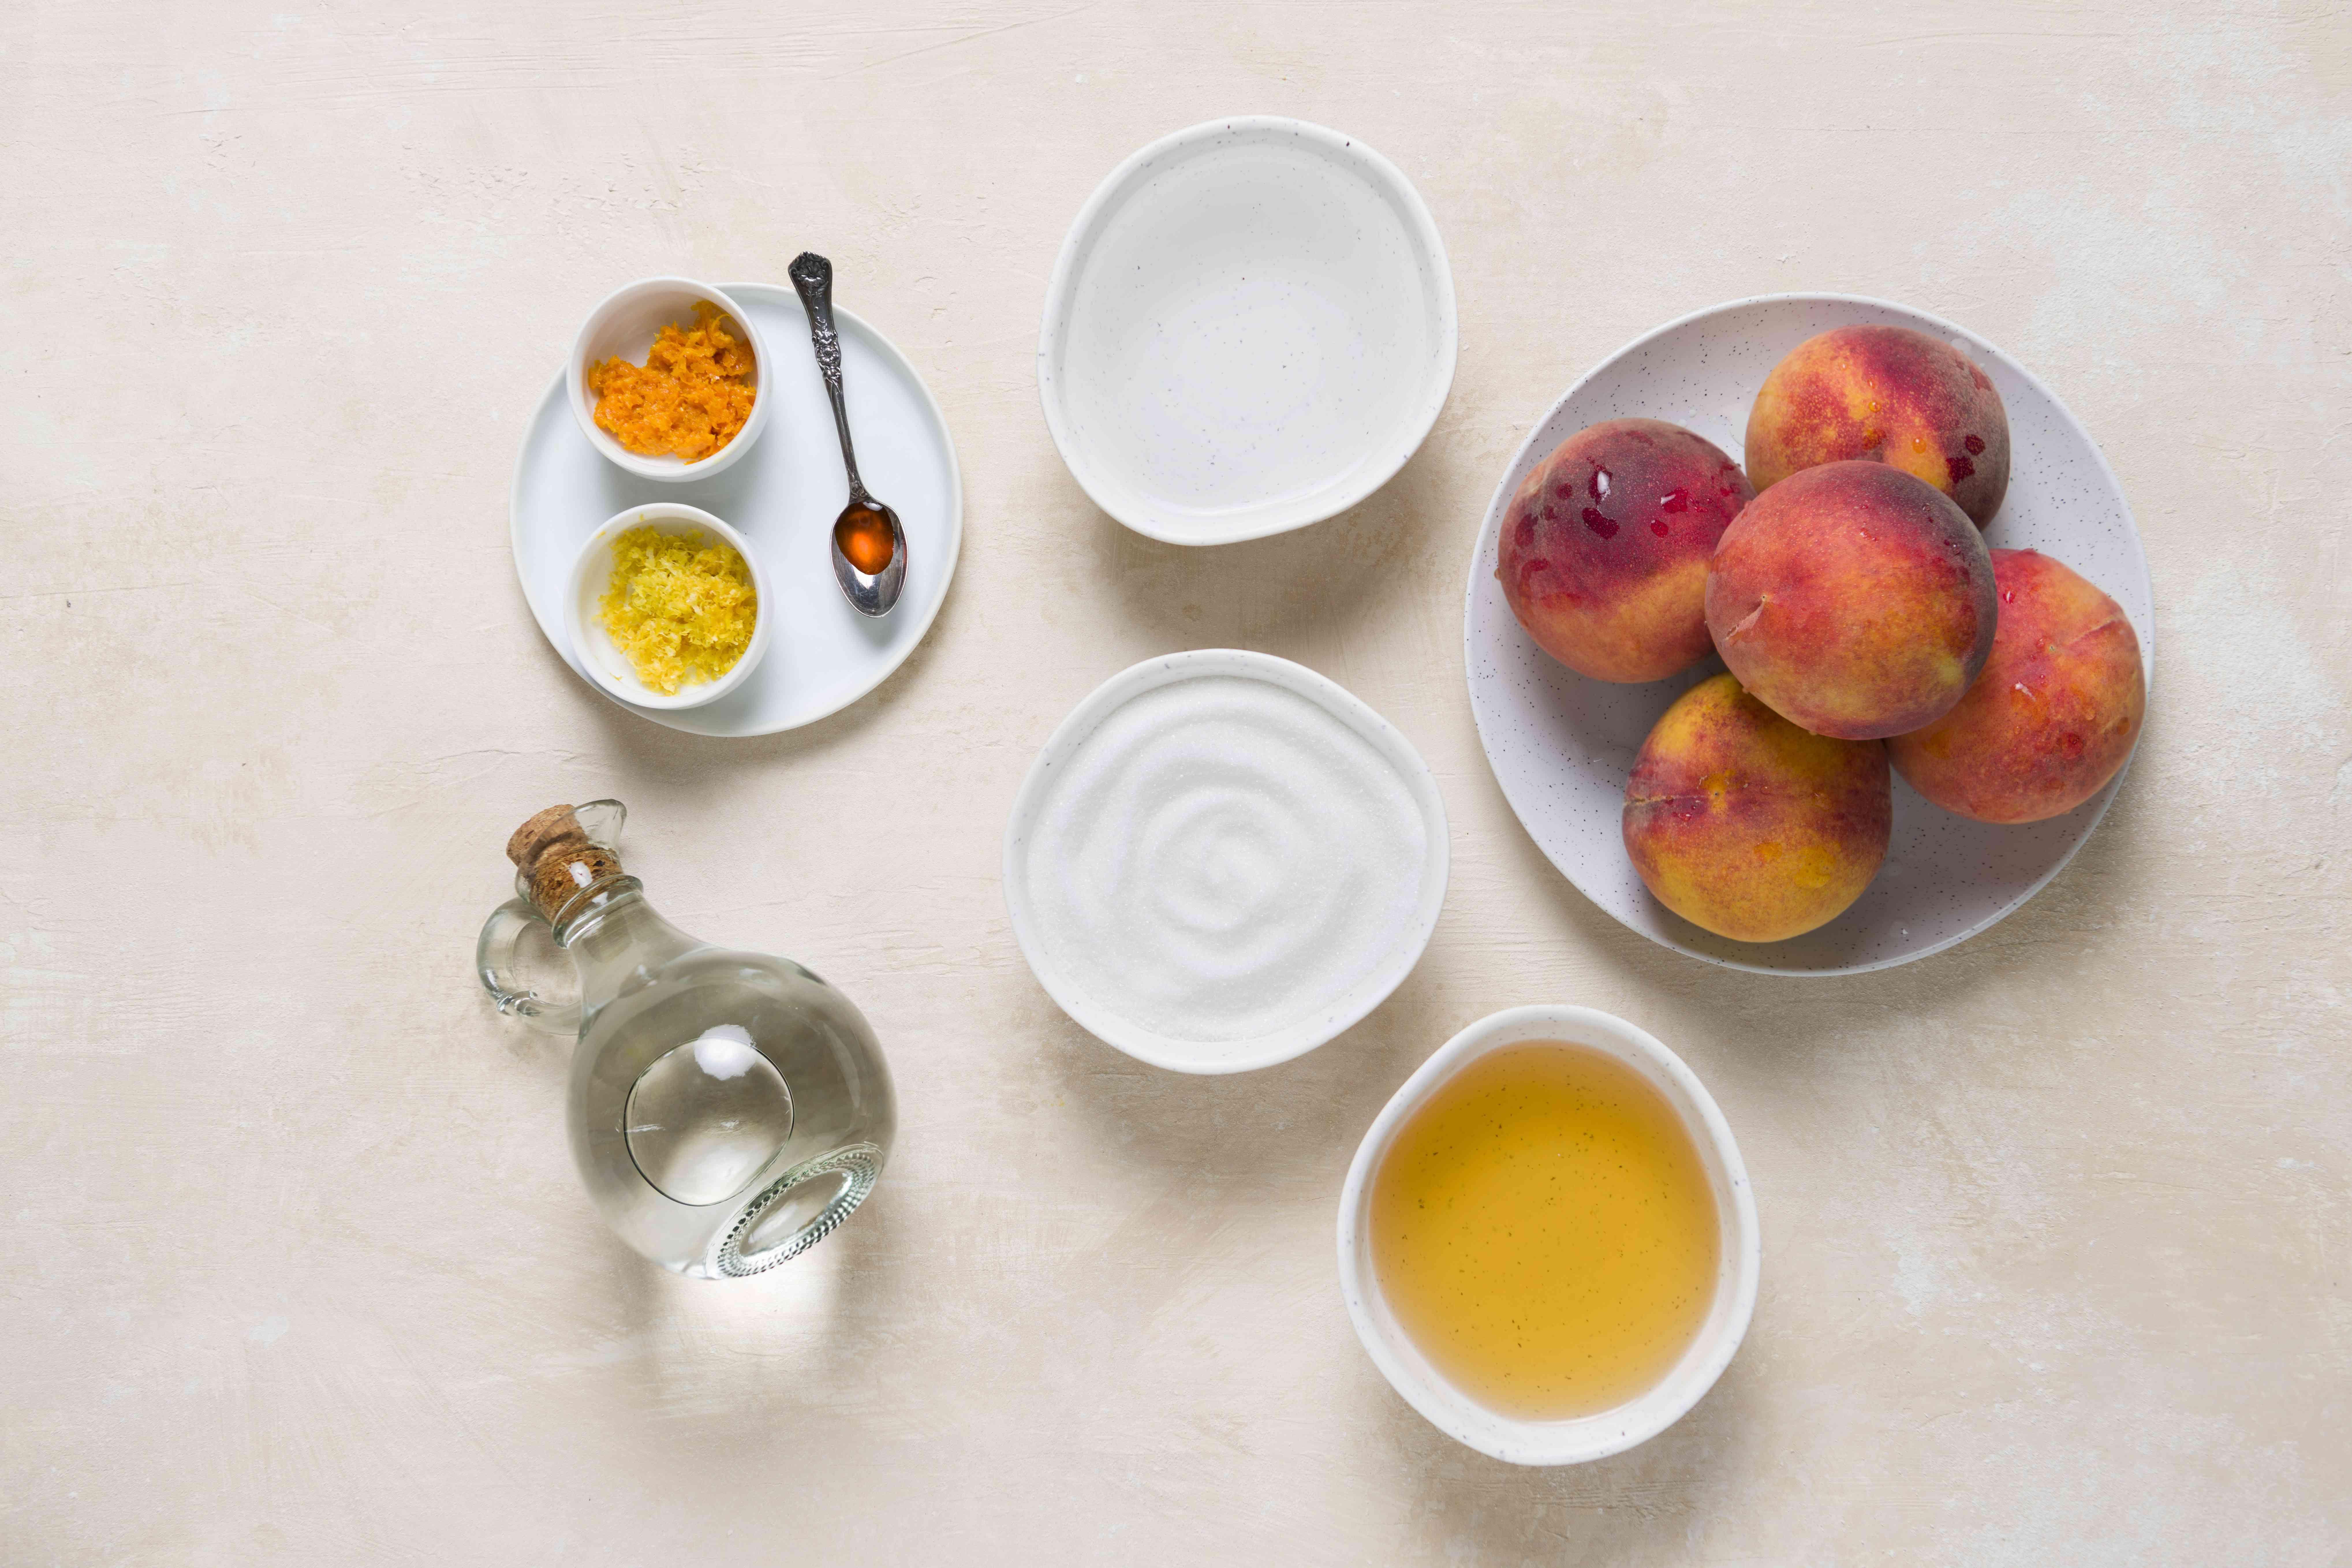 Ingredients to make peach liqueur